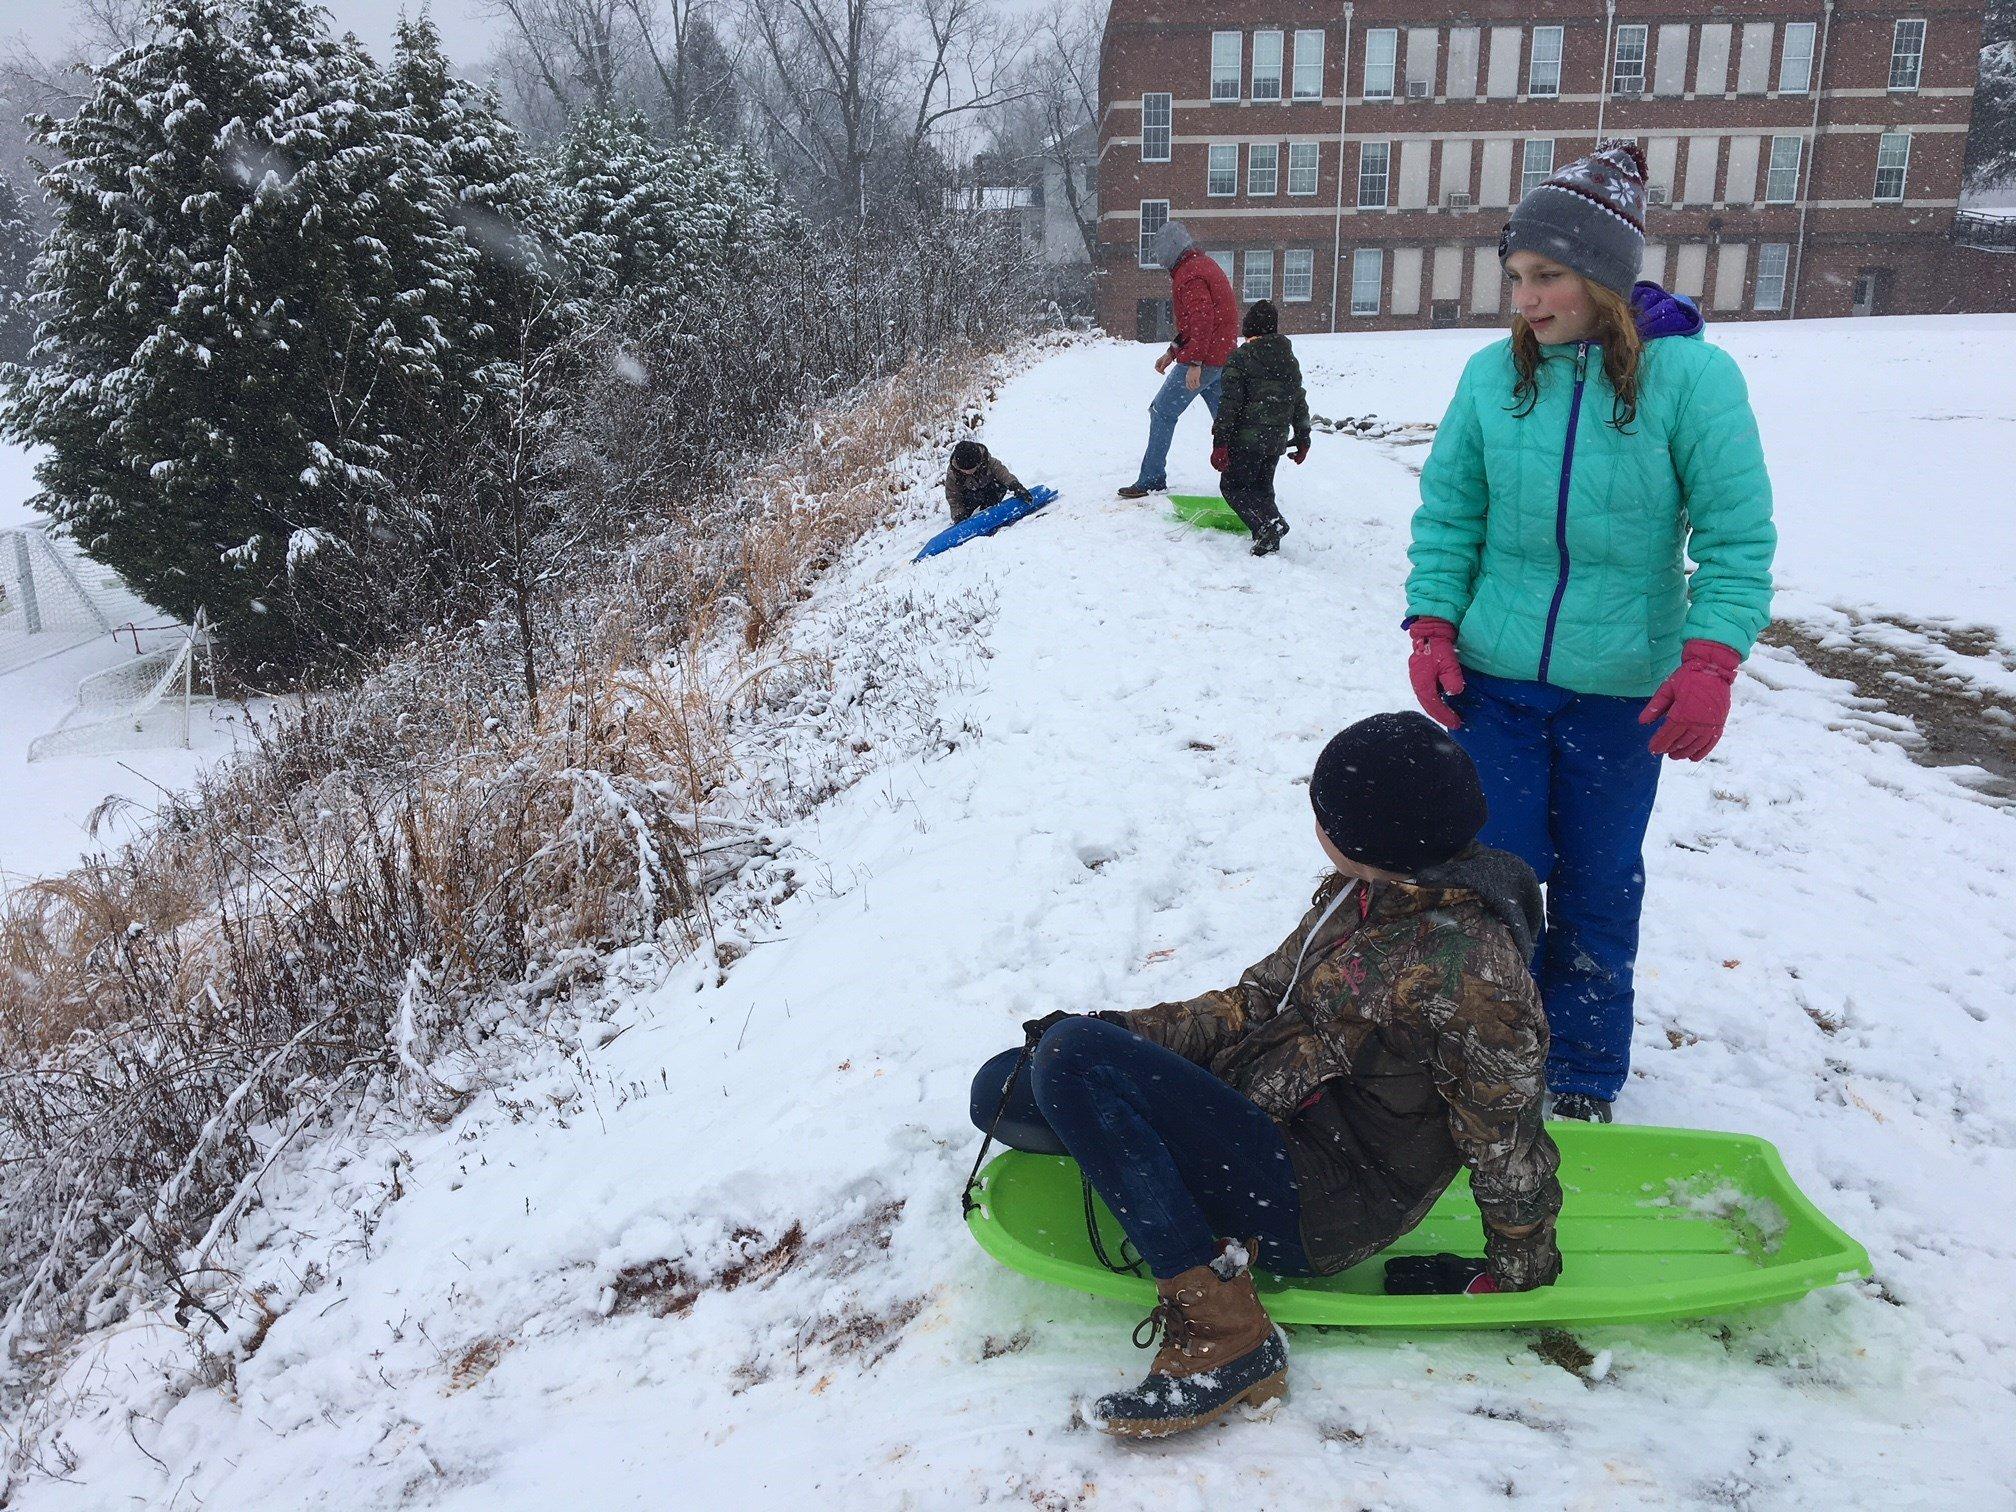 Union County children sled down hill behind YMCA (FOX Carolina: 1/17/18).